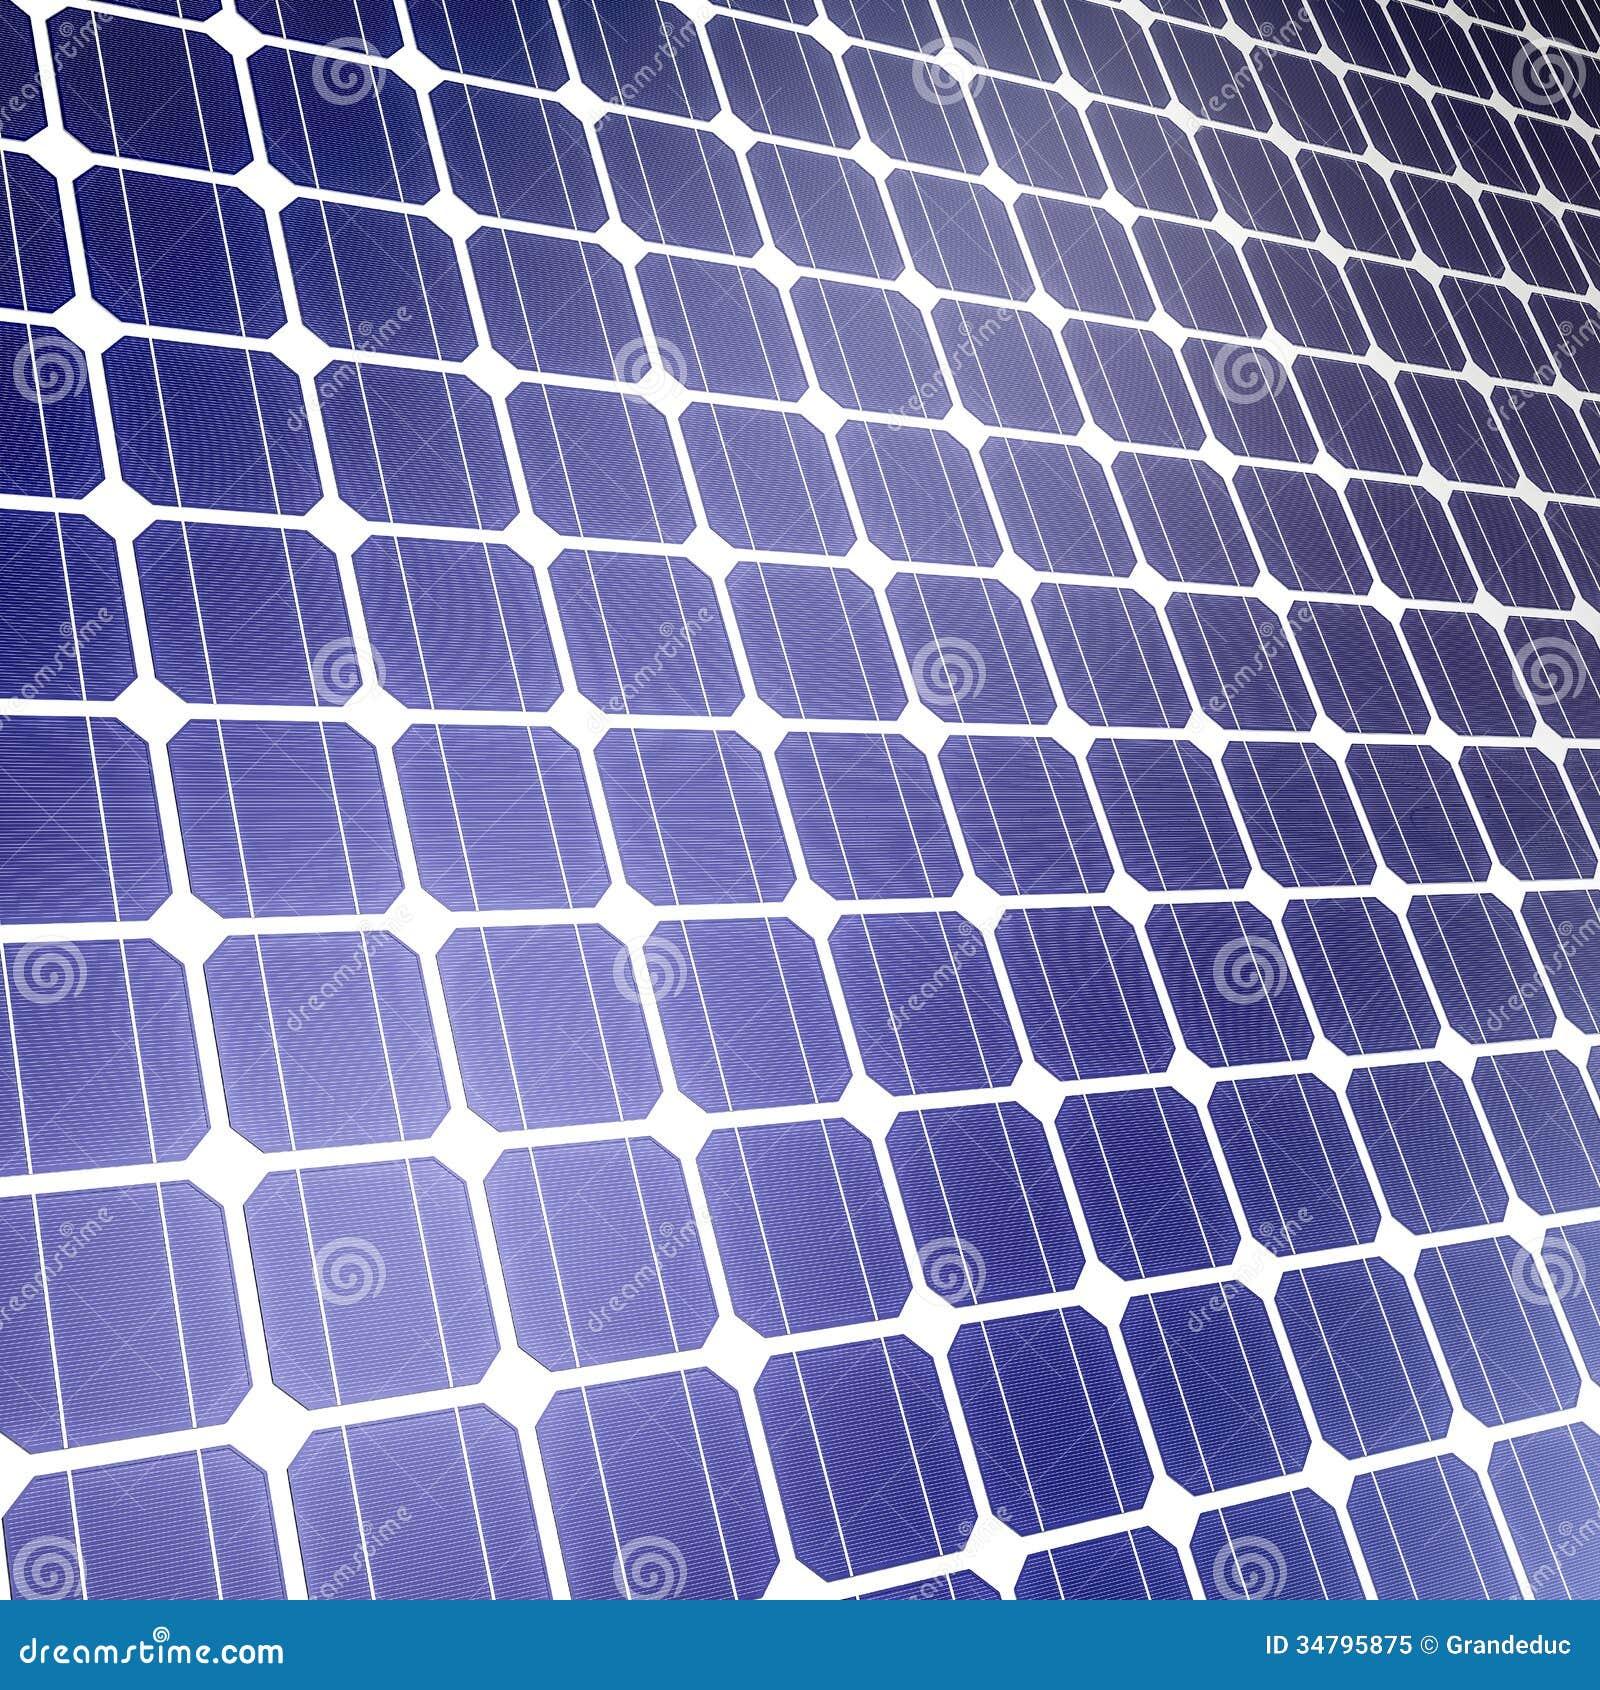 solar panel background - photo #43